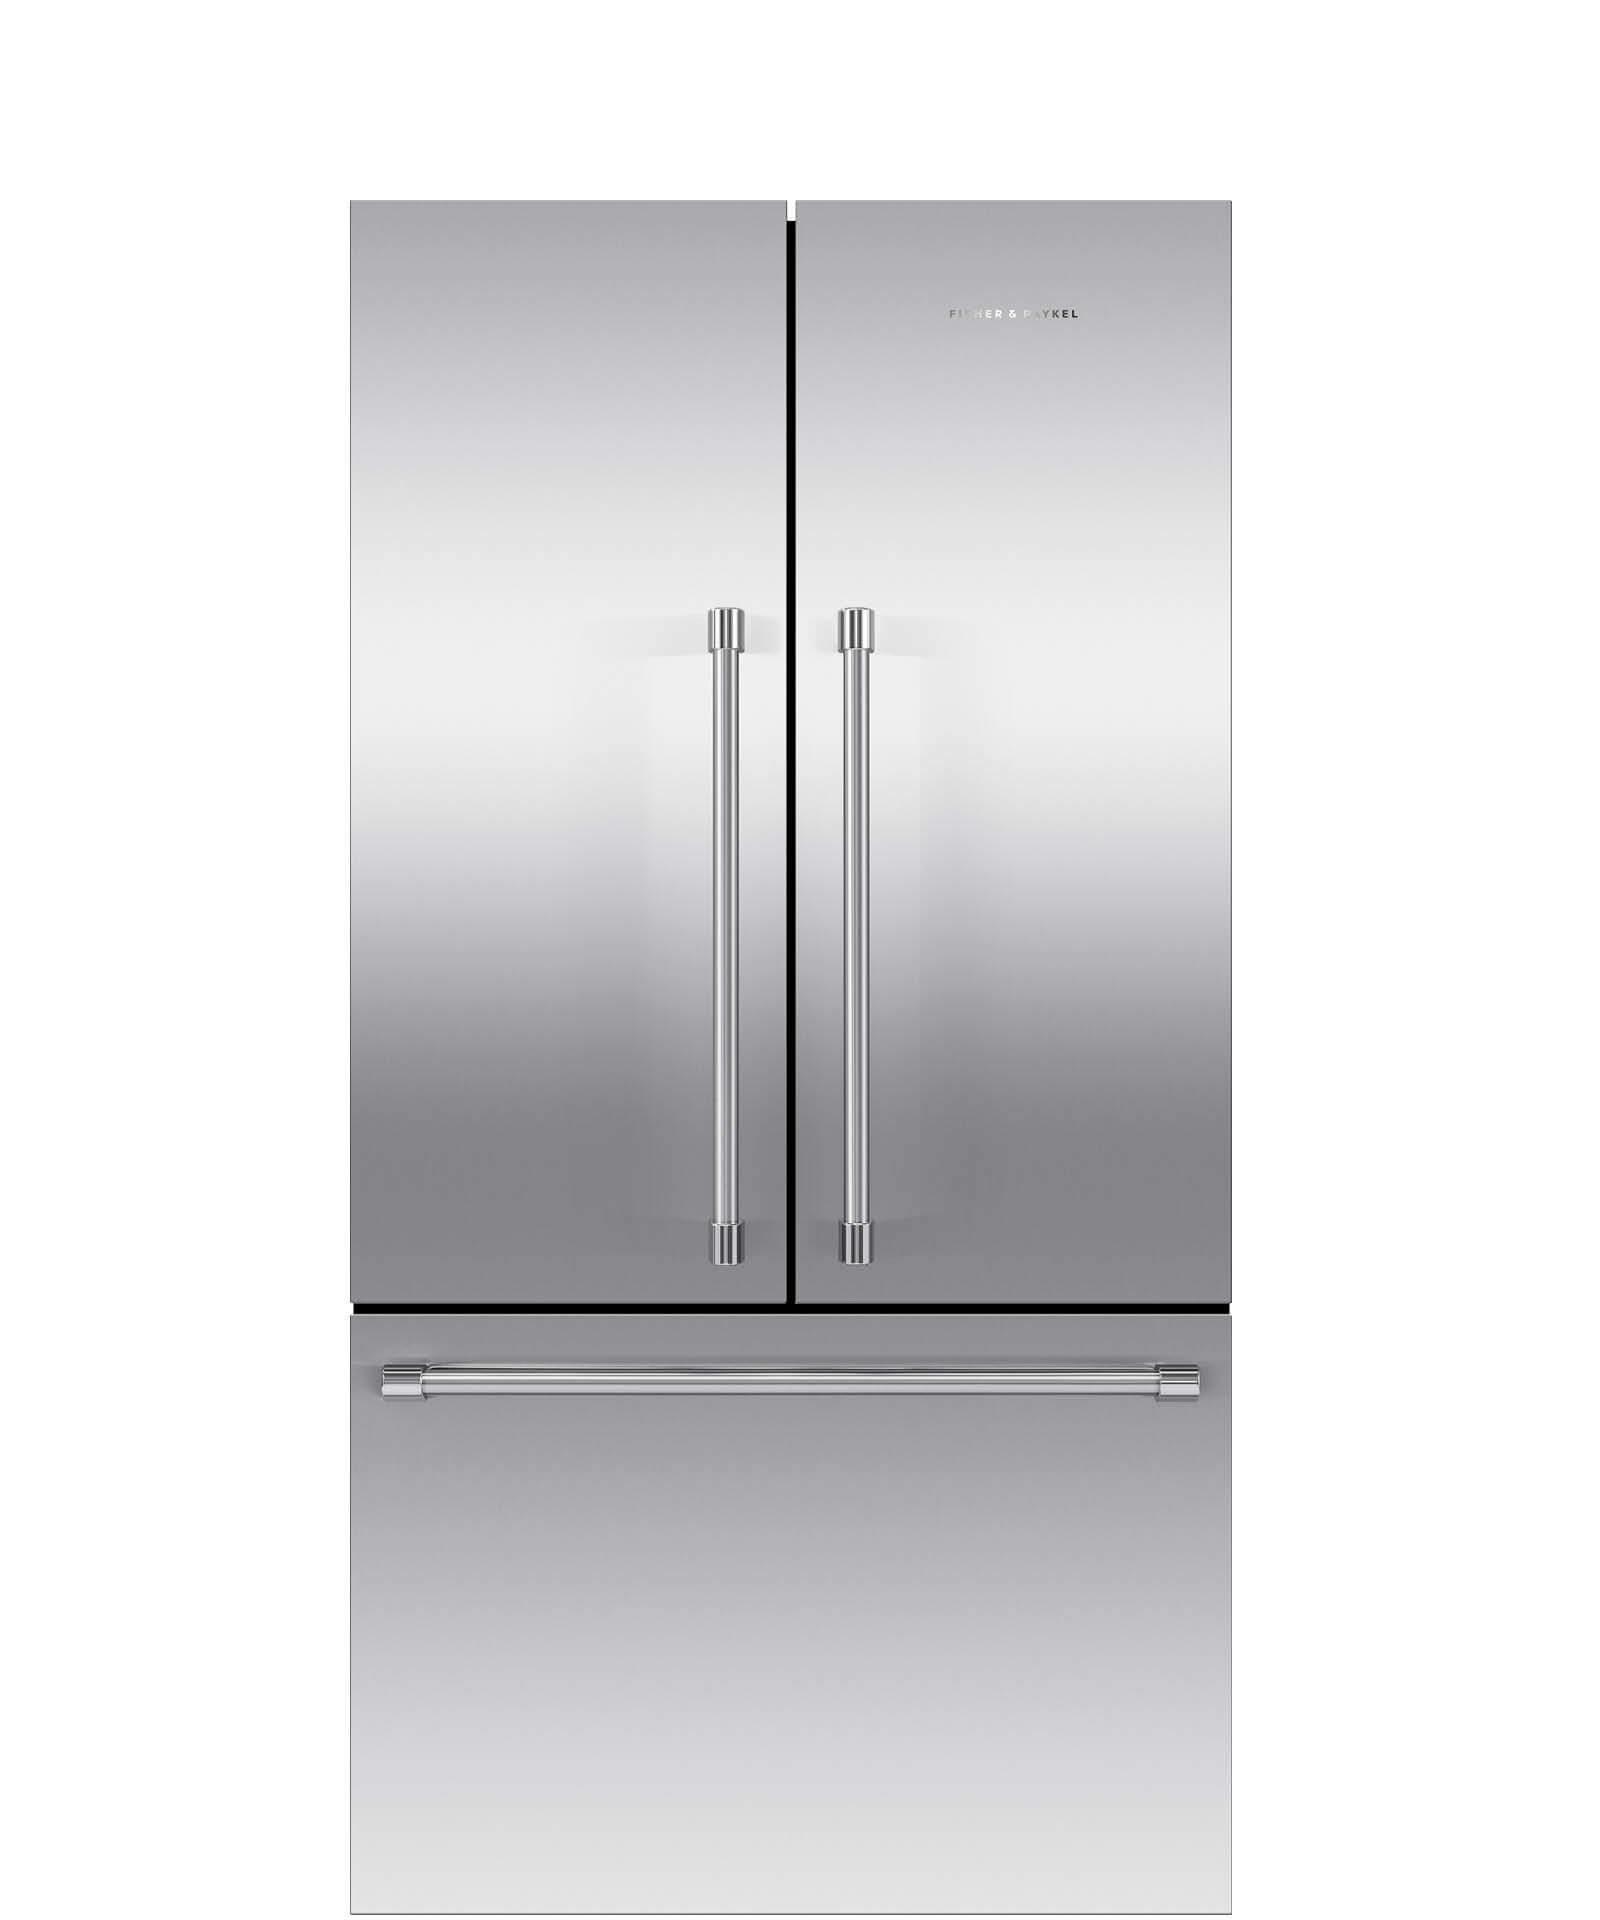 Rf201acjsx1n Activesmart Fridge French Door 36 Built In With Ice